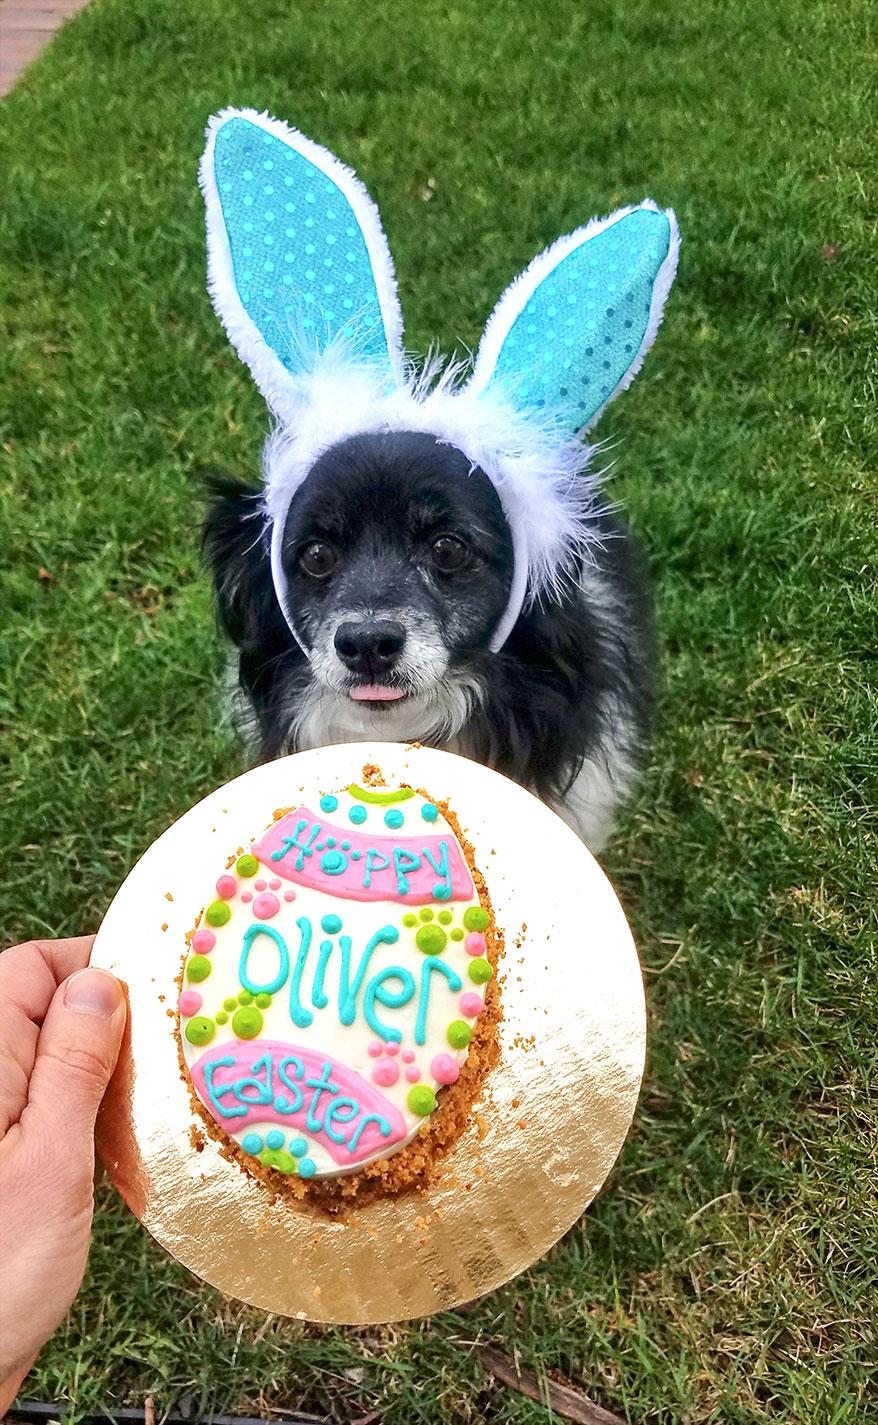 Happy Dog Barkery, IL birthday cake